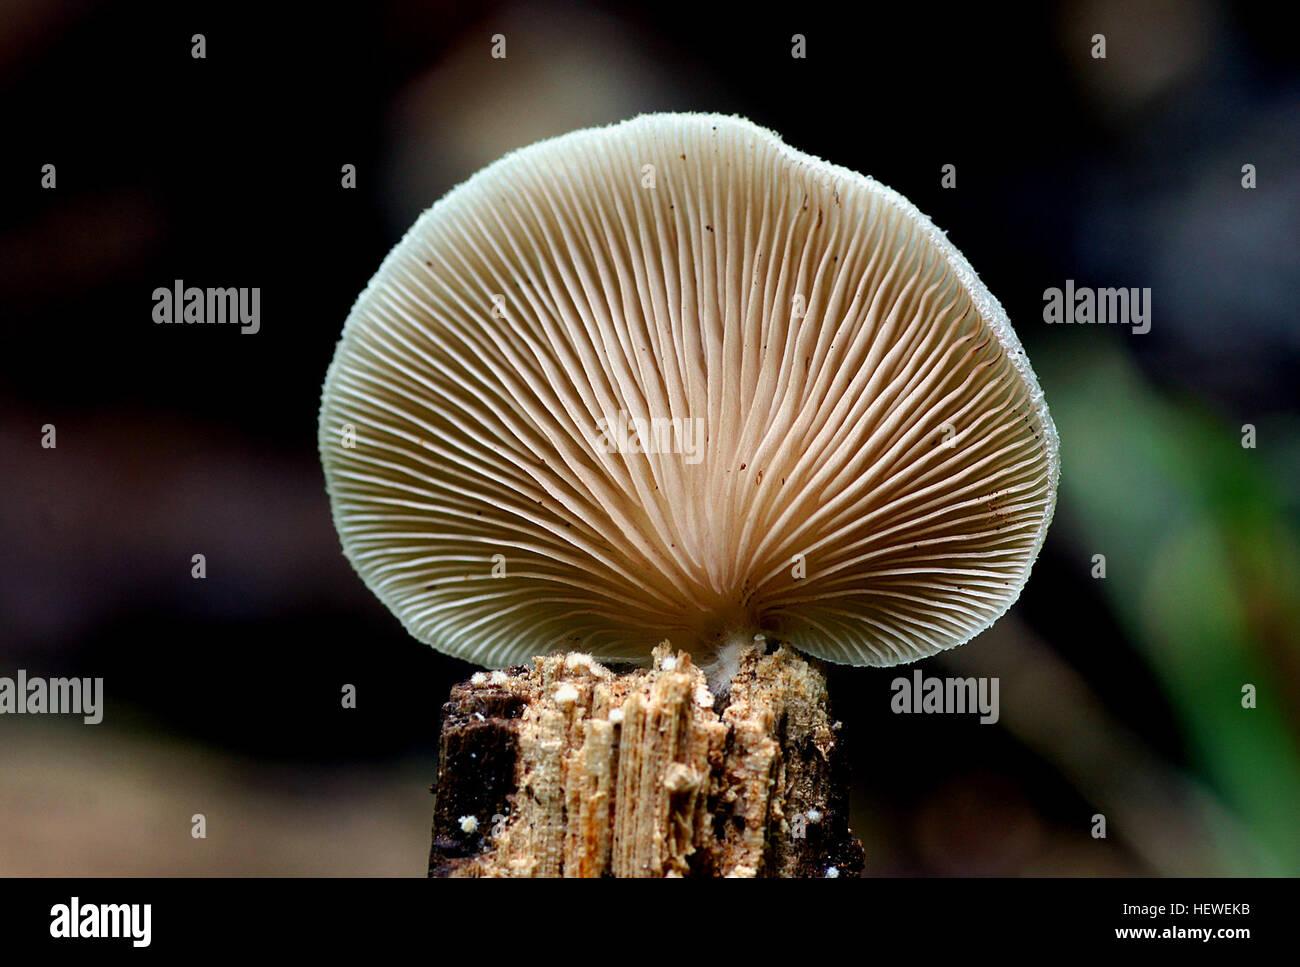 Crepidotus versutus  Crepidotus versutus, commonly known as the evasive agaric, is a species of fungi in the family - Stock Image